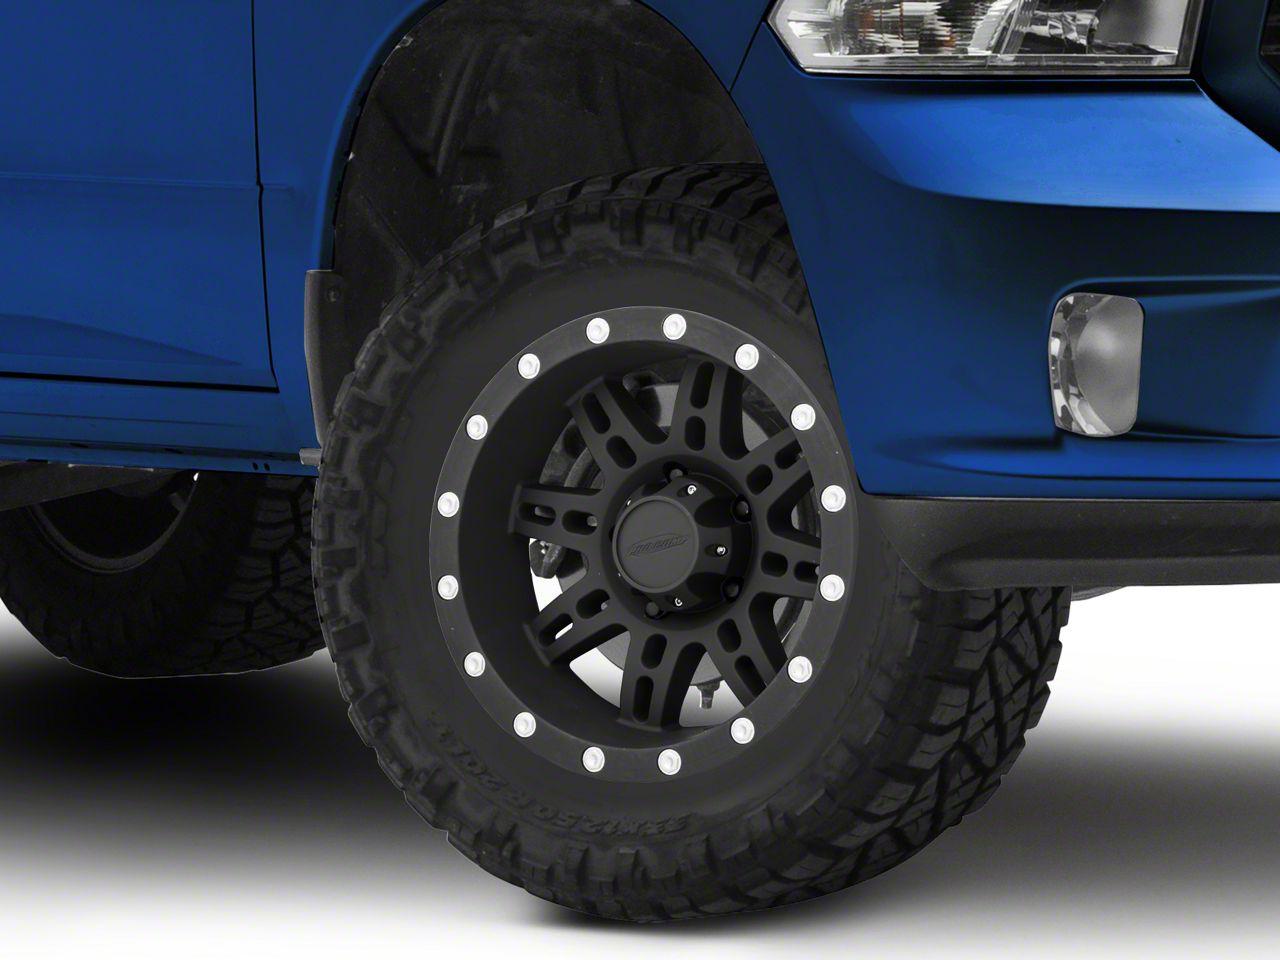 Pro Comp Series 7031 Matte Black 5-Lug Wheel - 17x9 (02-18 RAM 1500, Excluding Mega Cab)